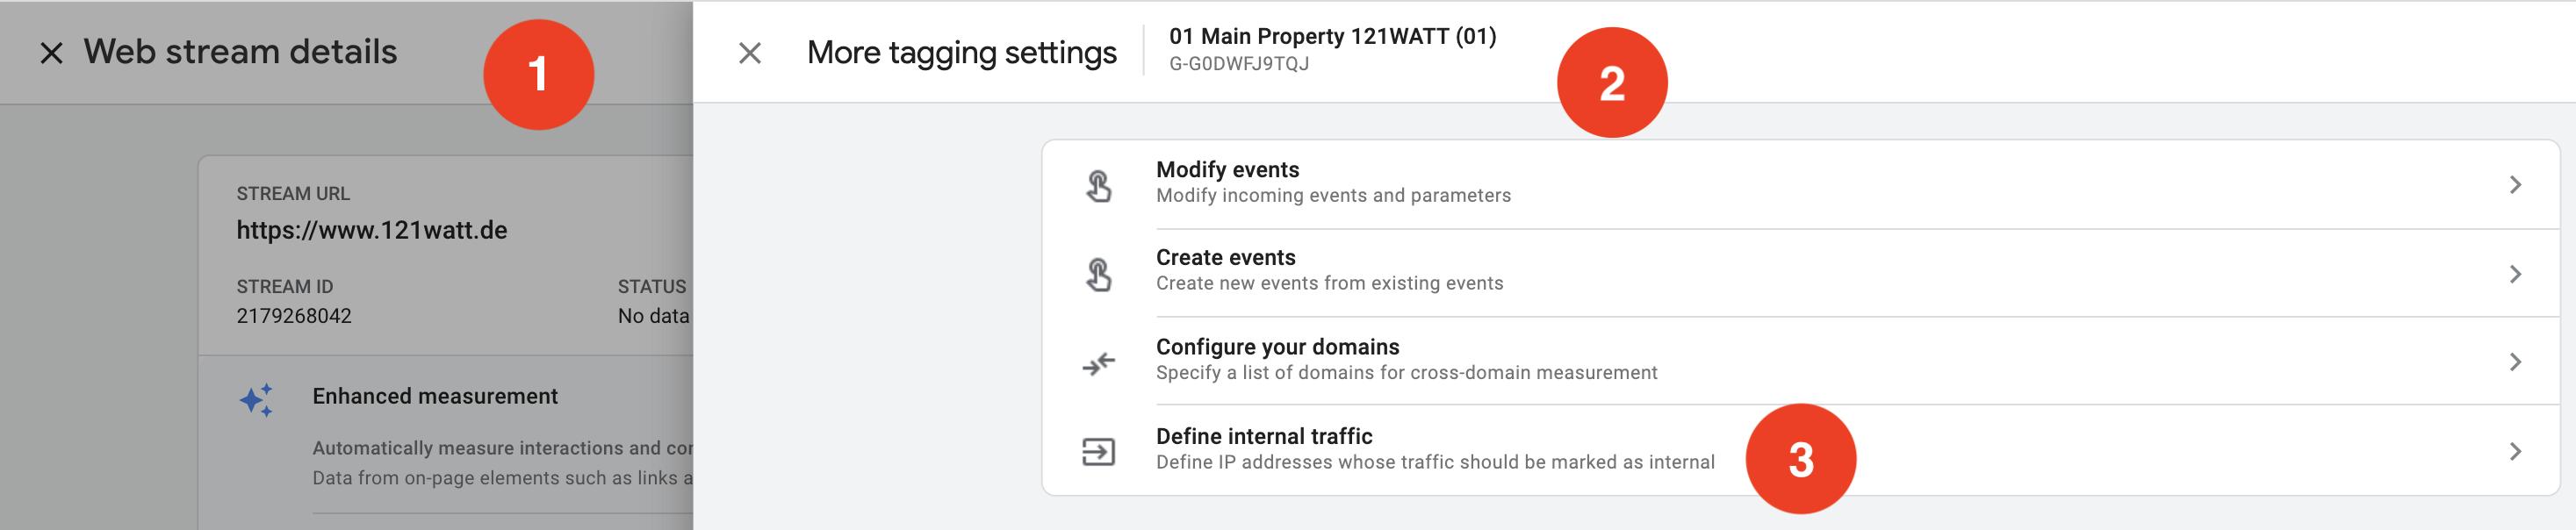 define-internal-traffic-ga4 universal analytics Google Analytics 4 property Google Analytics 4 GA4 property GA4